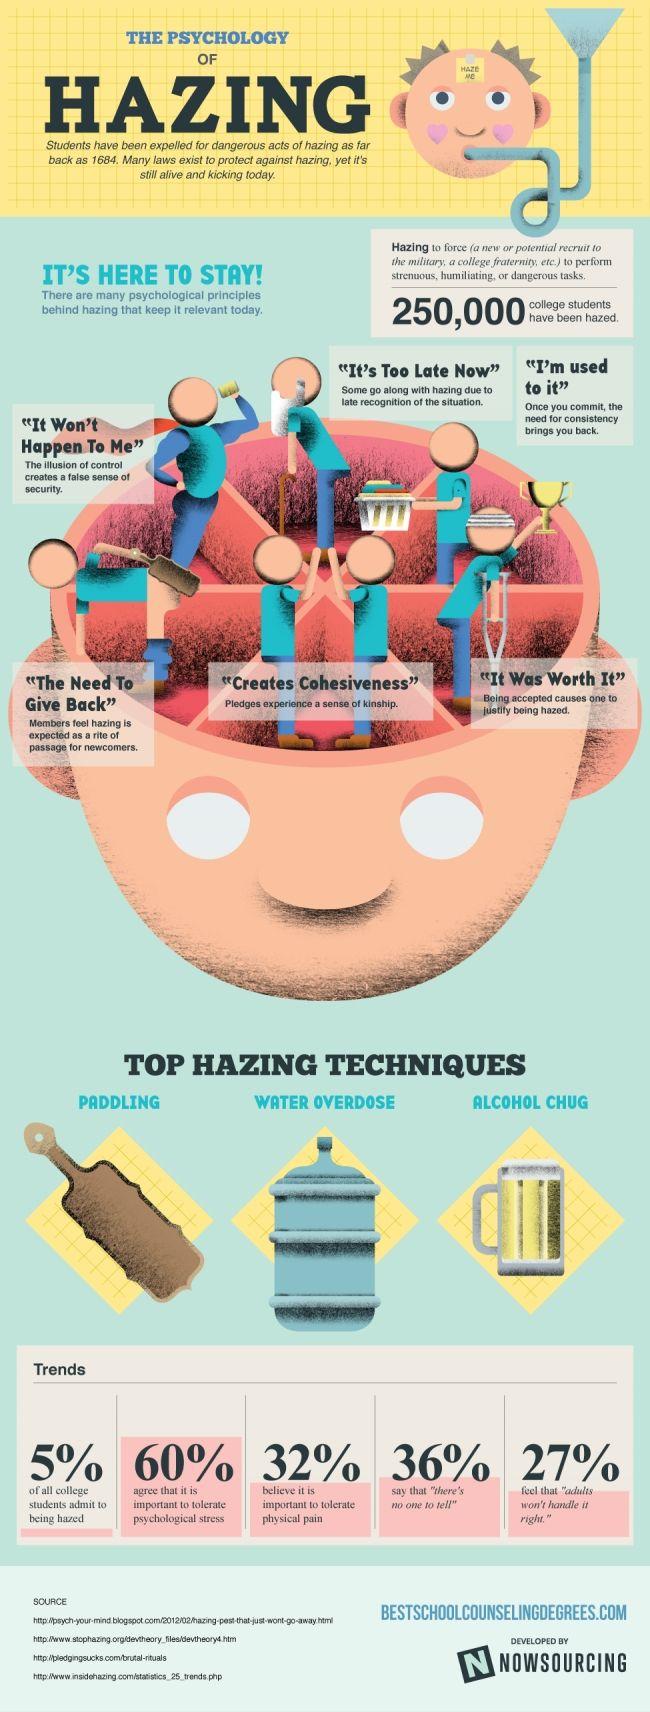 Philanthropy | Hazing Prevention | The Psychology of Hazing | Perfect for National Hazing Prevention Week!